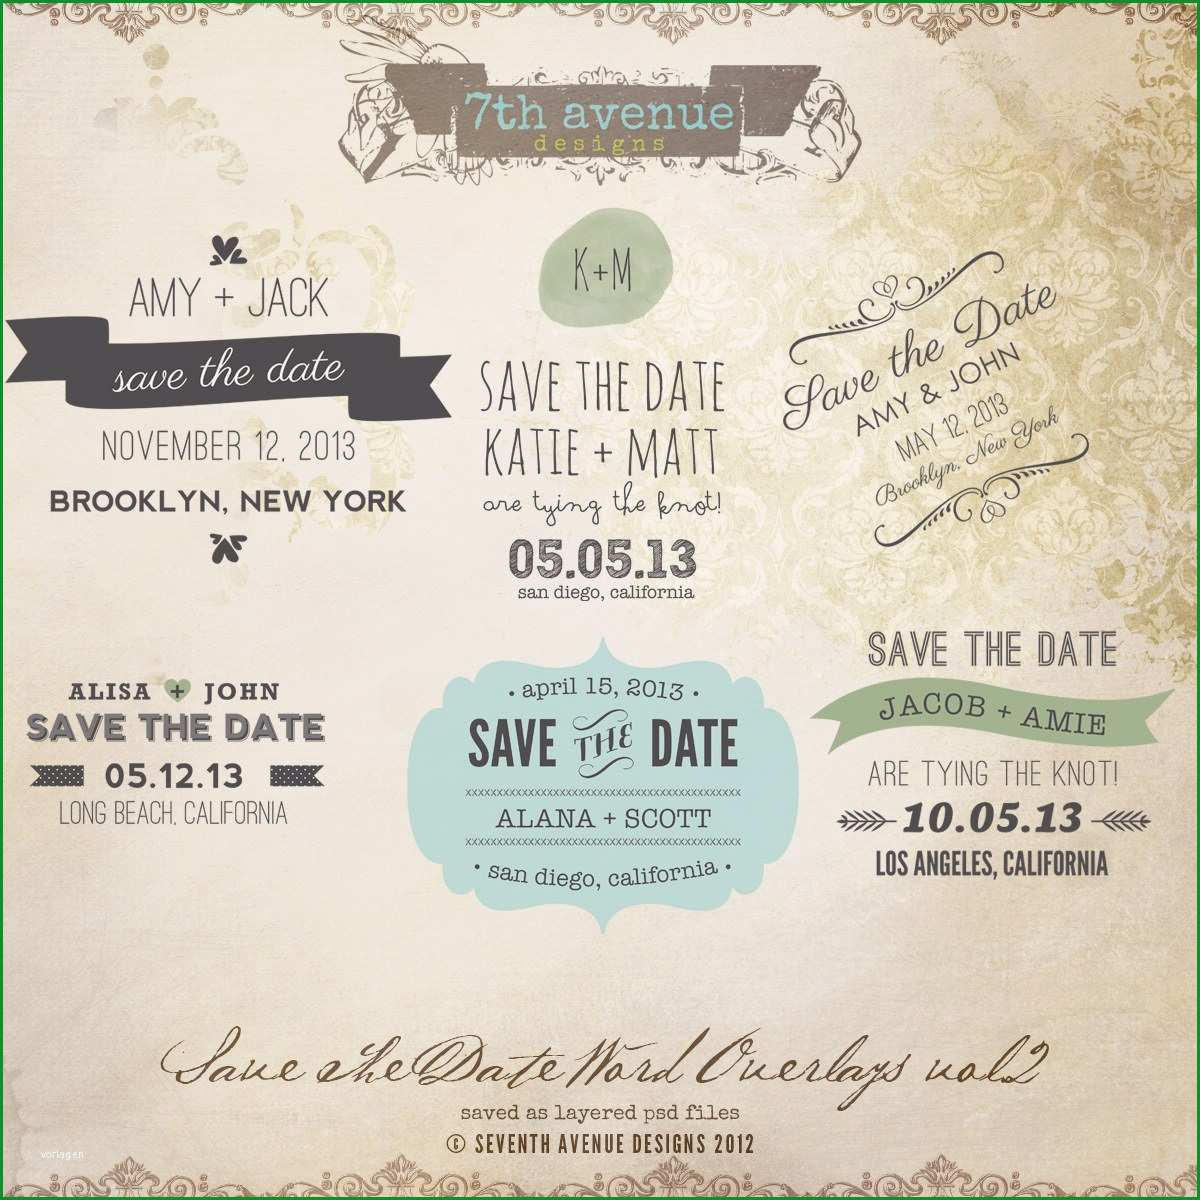 save the date vorlage word